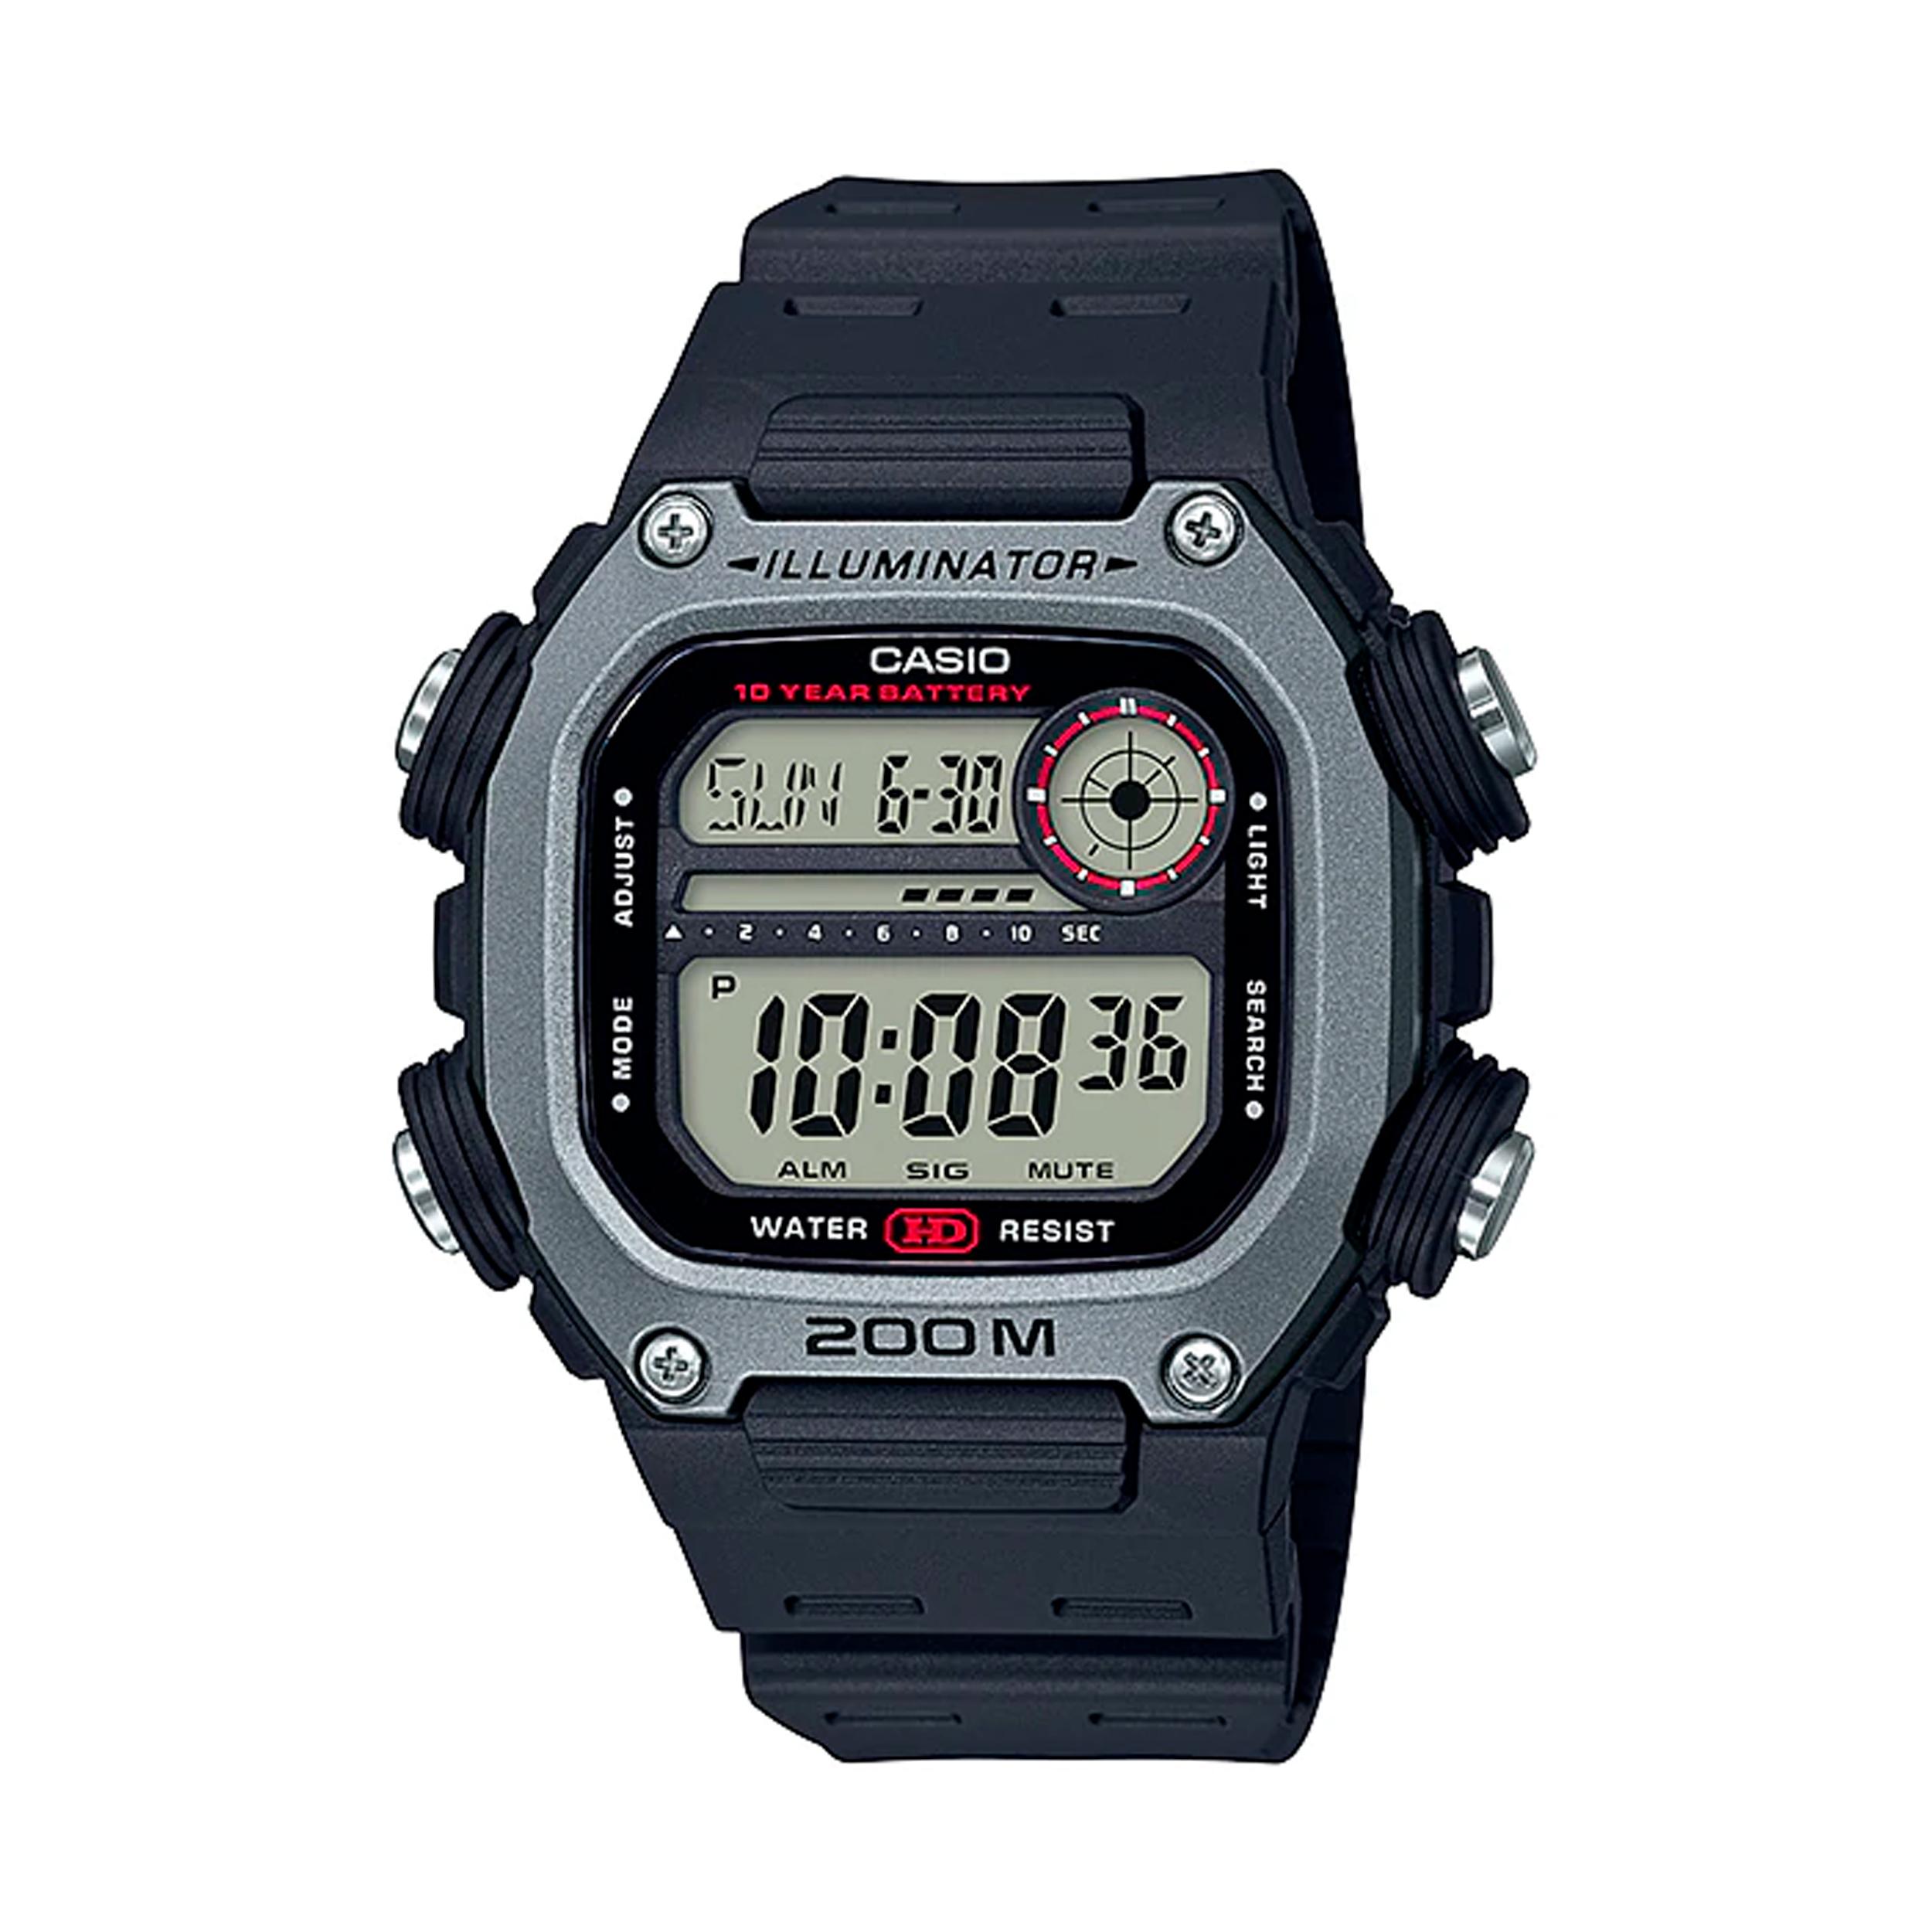 ساعت مچی دیجیتال مردانه کاسیو مدل DW-291H-1AVDF             قیمت